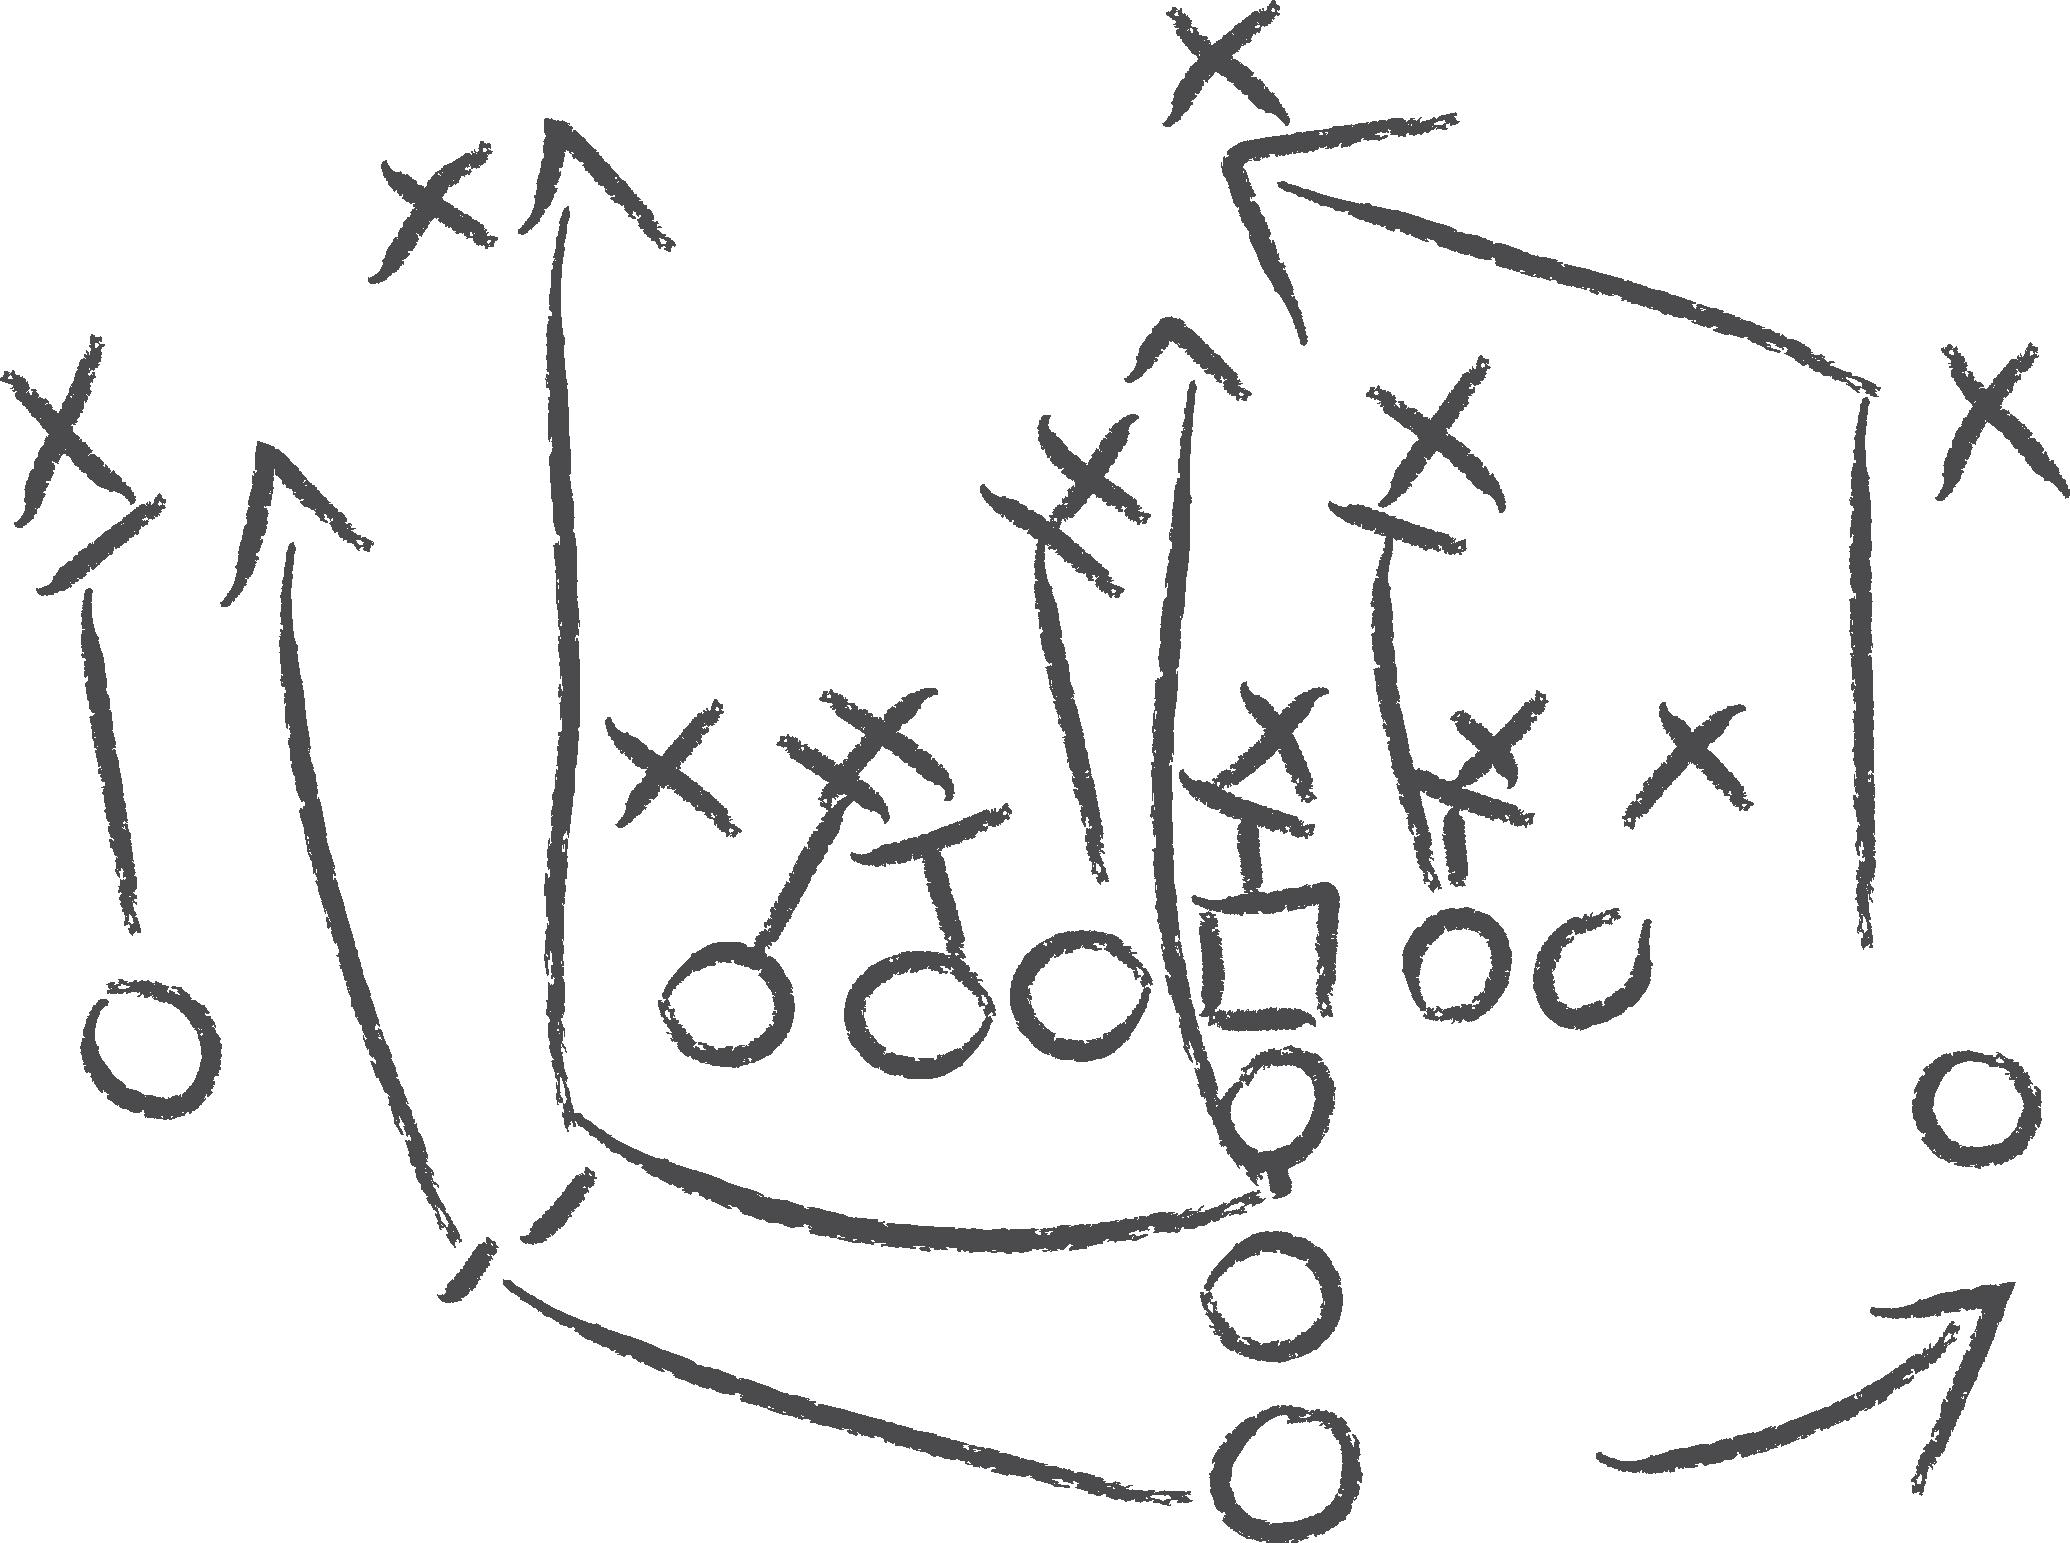 Football playbook clipart png transparent library Football Playbook Drawing at GetDrawings.com | Free for personal use ... png transparent library